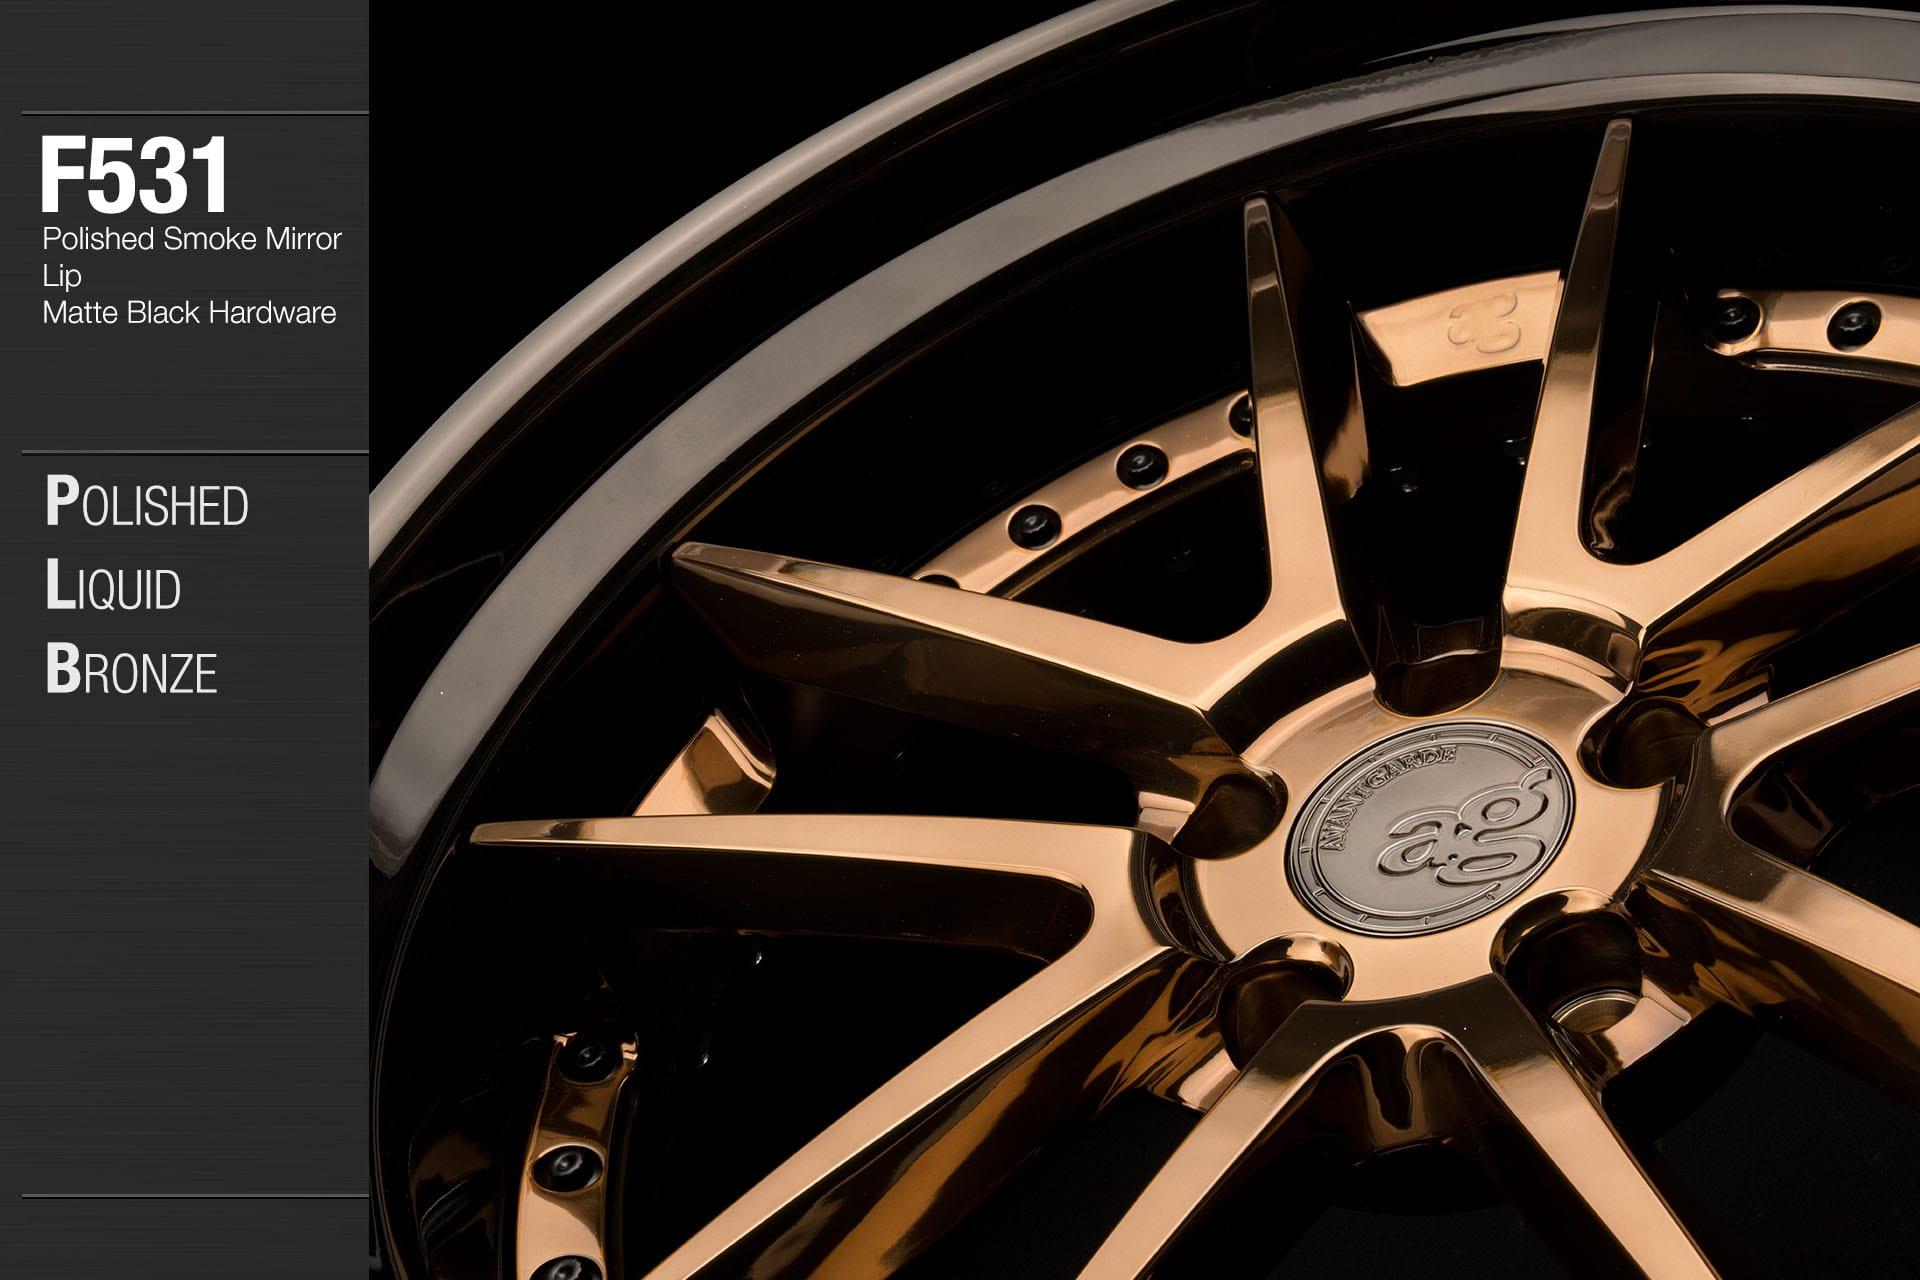 avant-garde-ag-wheels-f531-polished-liquid-bronze-face-smoke-mirror-lip-matte-black-hardware-2-min